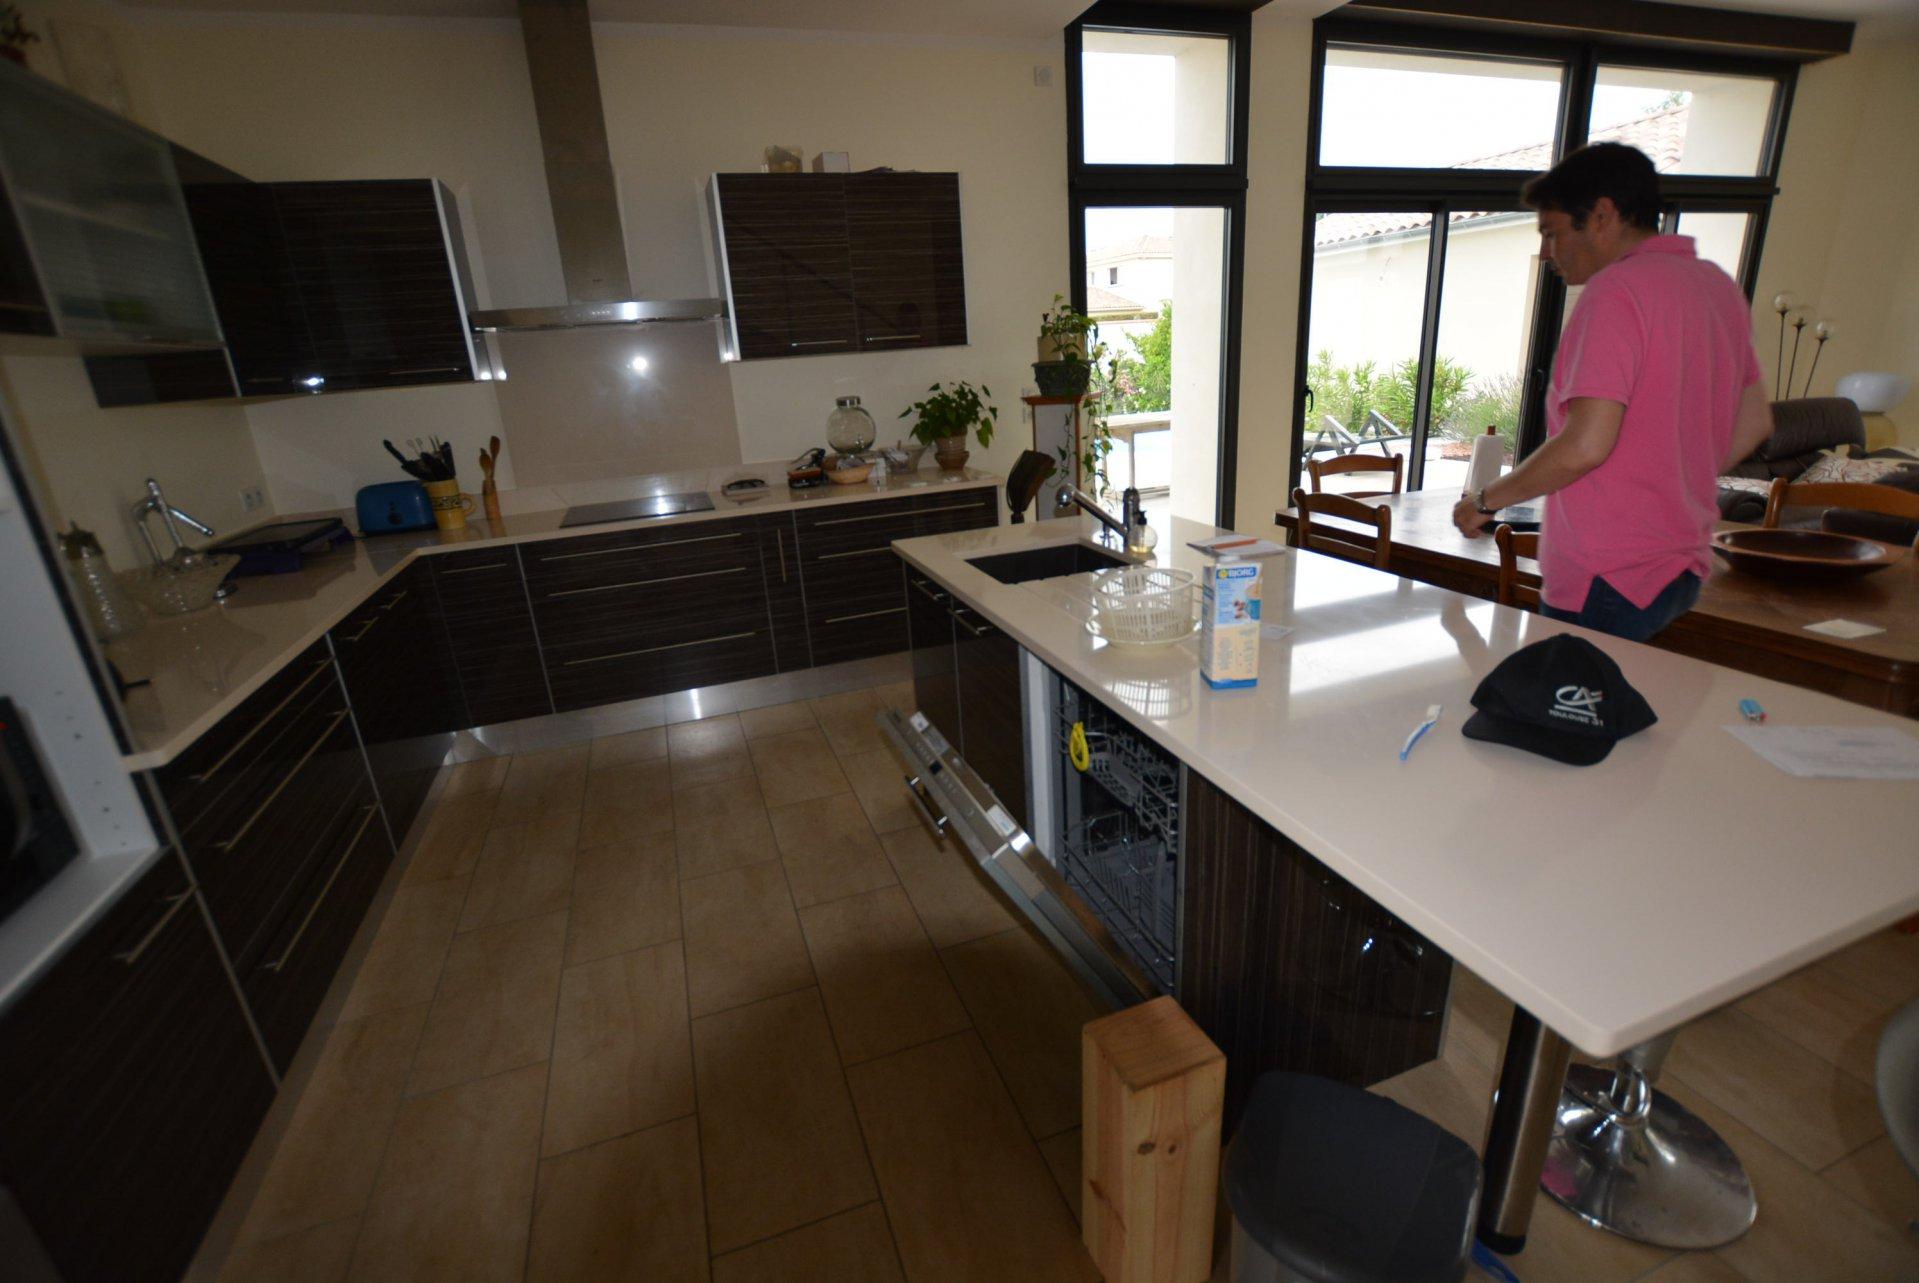 Küchentheke, Edelstahl, Kücheninsel